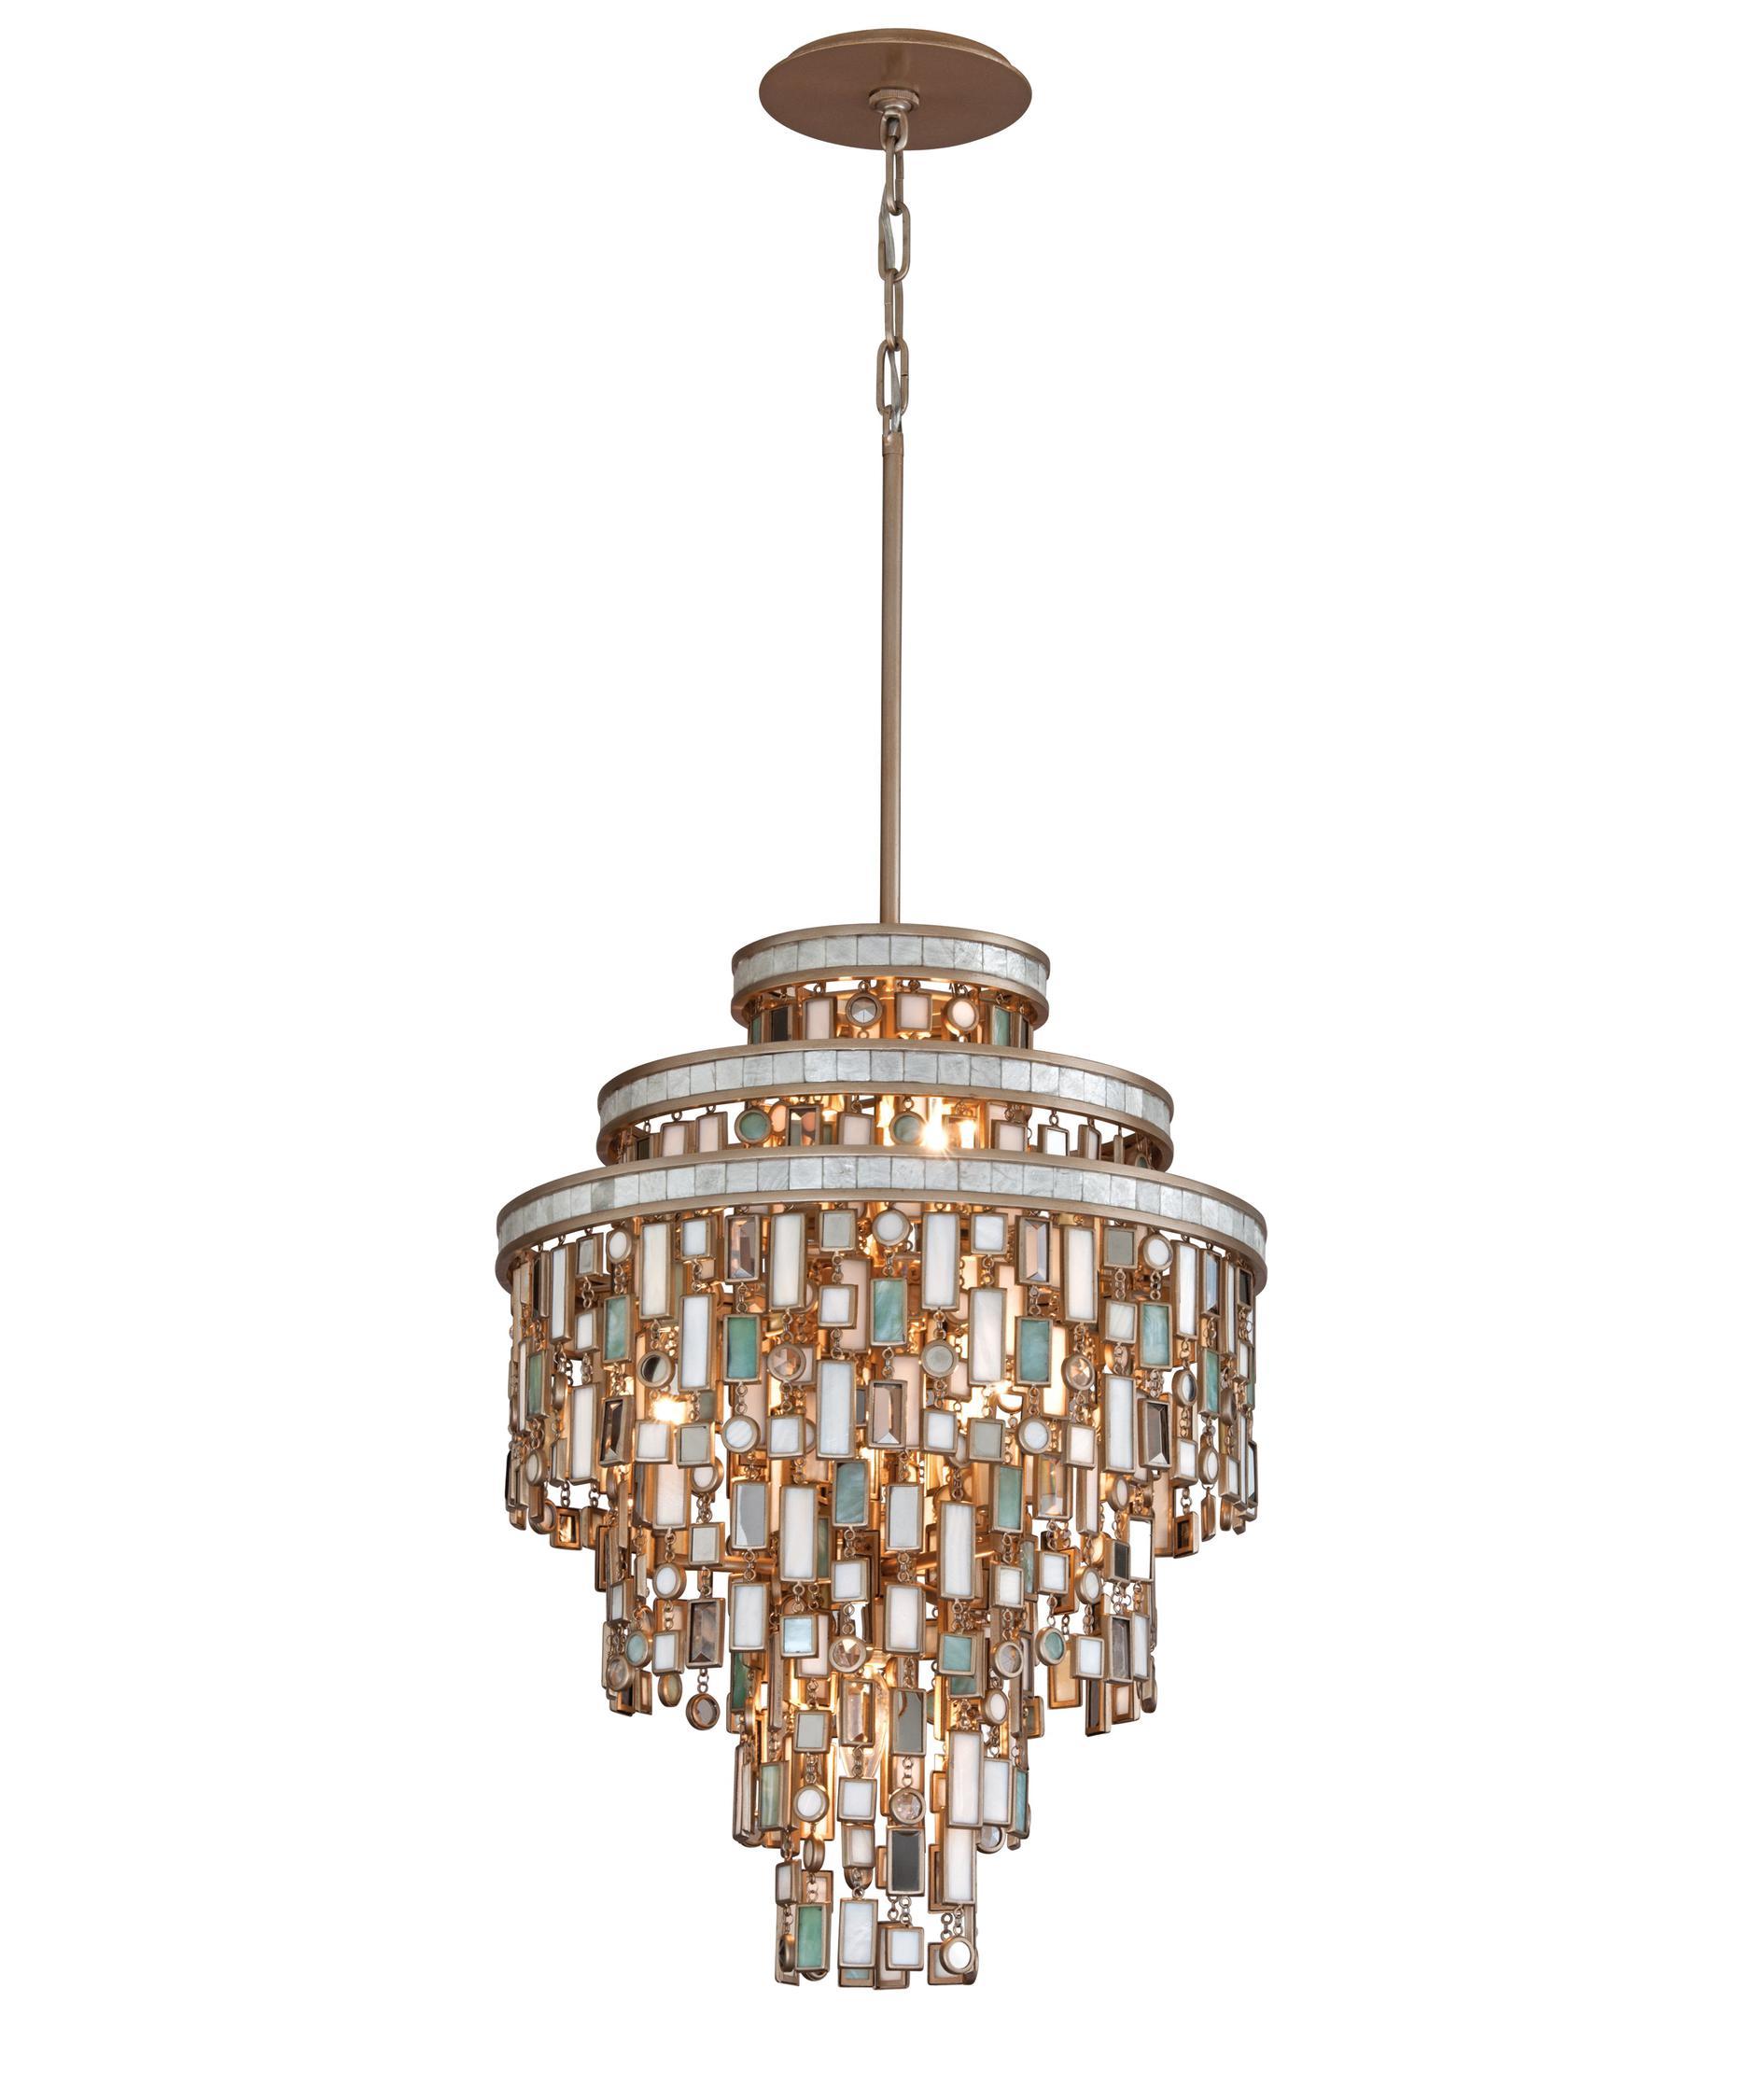 Corbett Lighting 142 47 Dolcetti 18 Inch Large Pendant